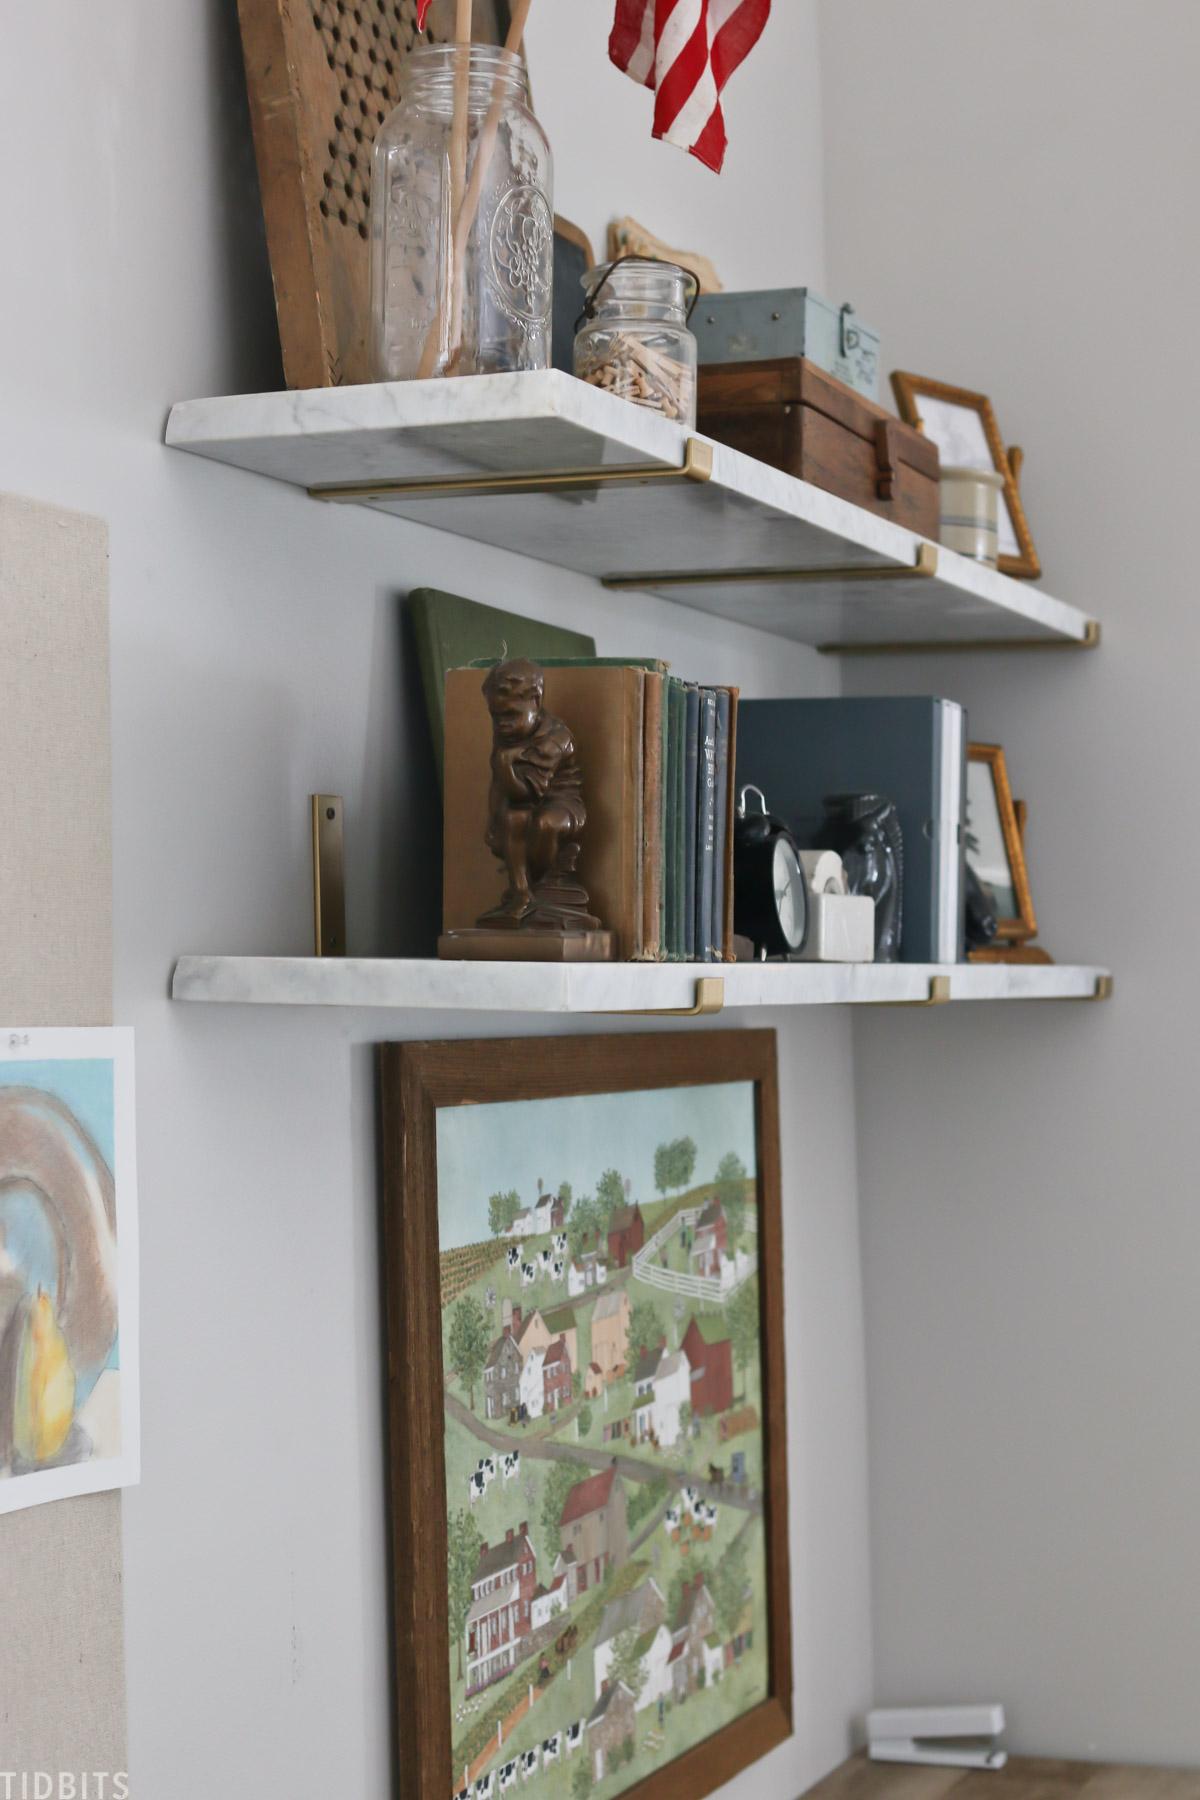 Bookends holding up a bookshelf on a floating shelf